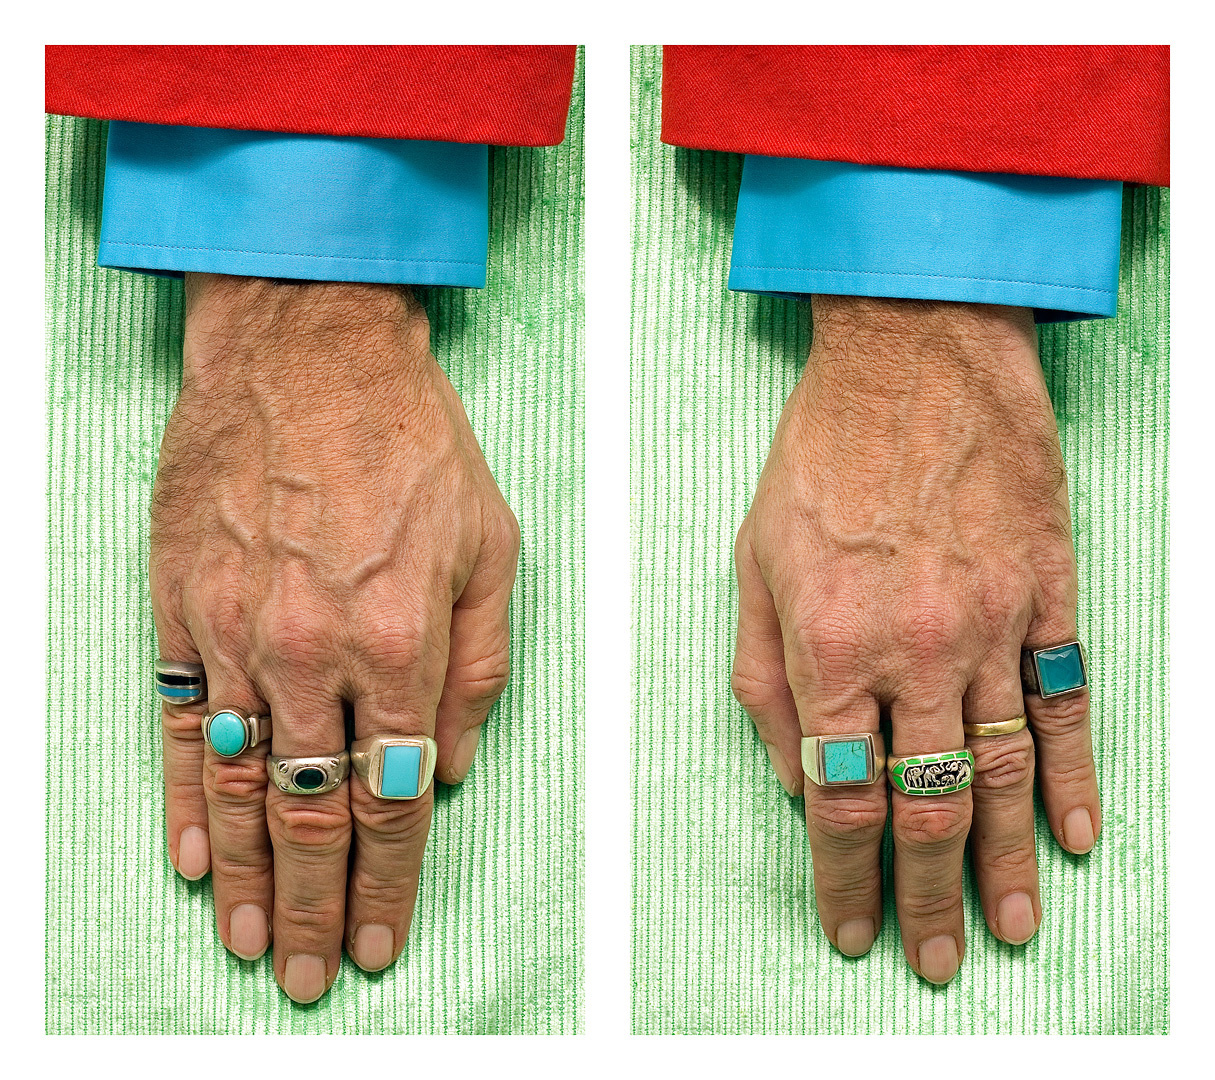 palms 23    2006    31.5X28 cm    c-print